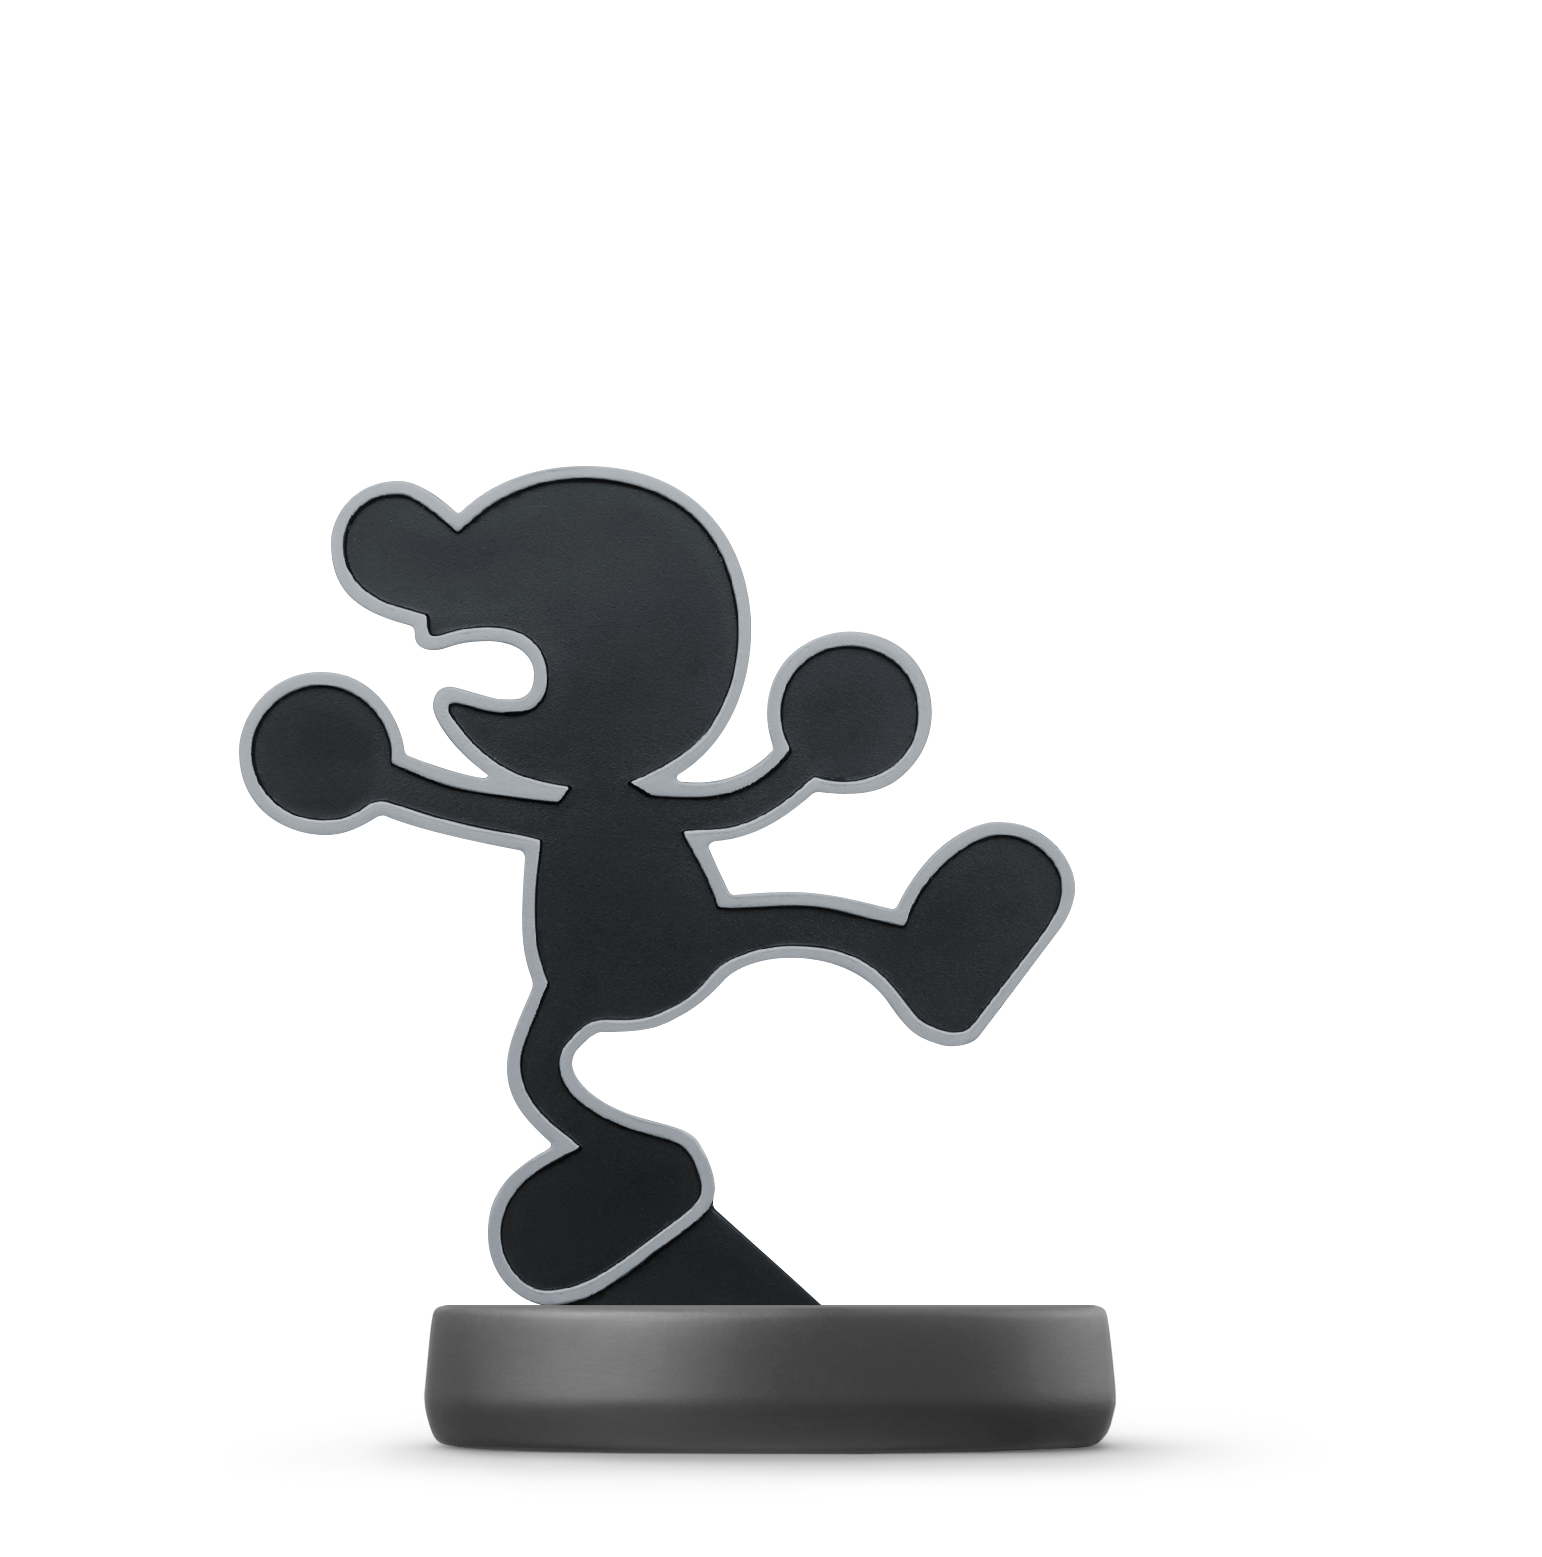 Amiibo/Mr. Game & Watch